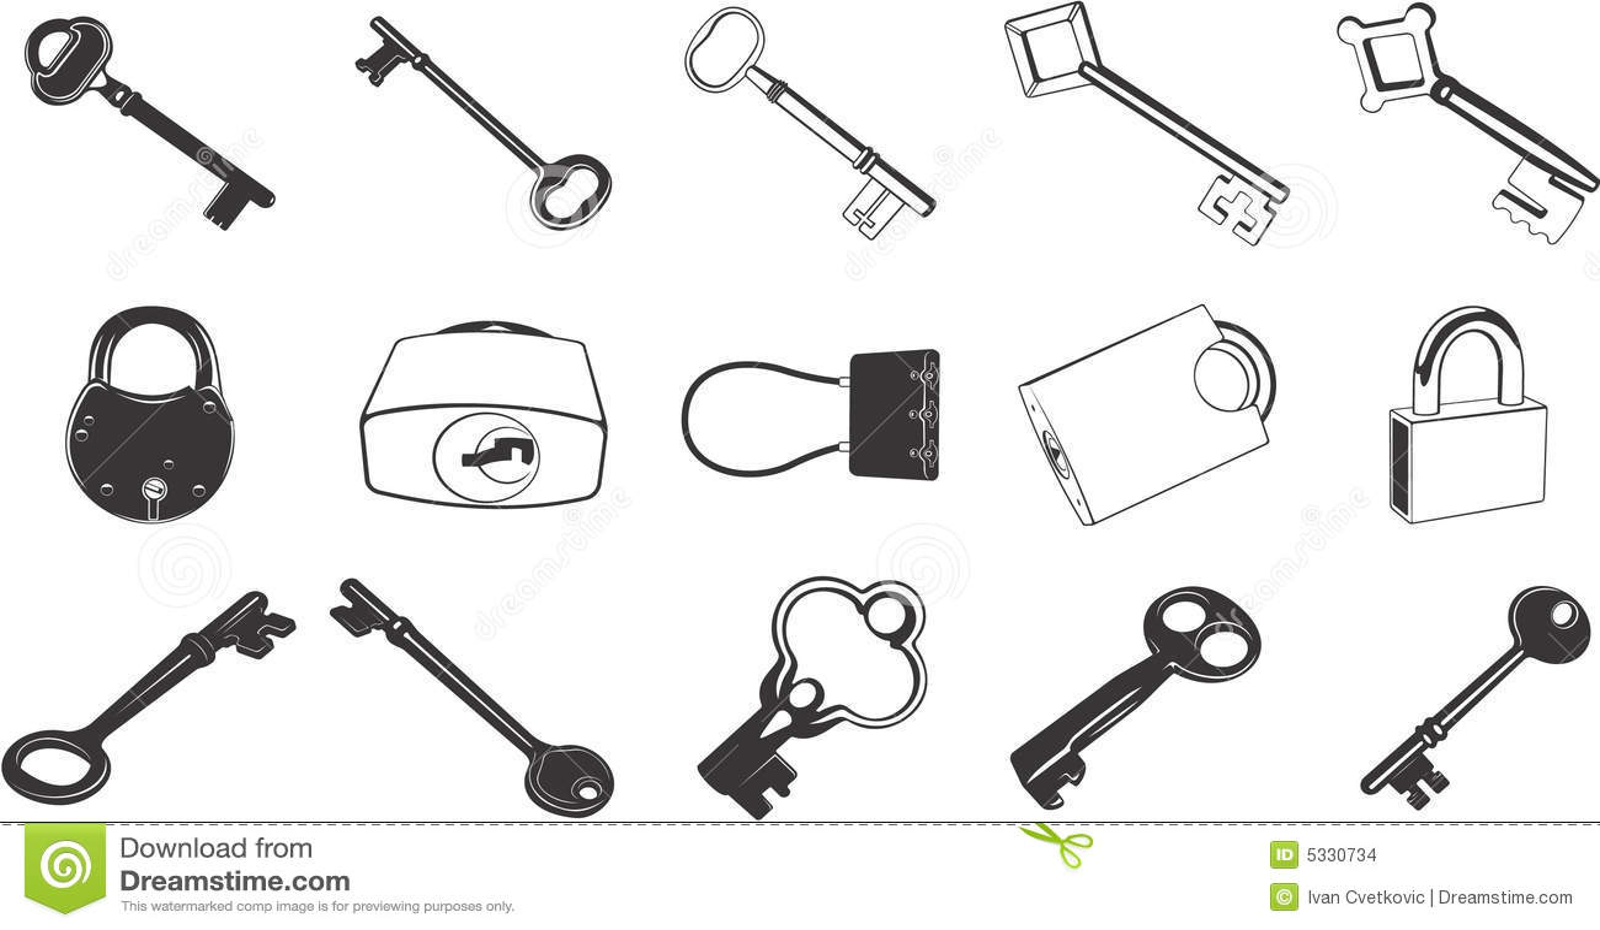 Key And Lock Illustration Set Stock Images